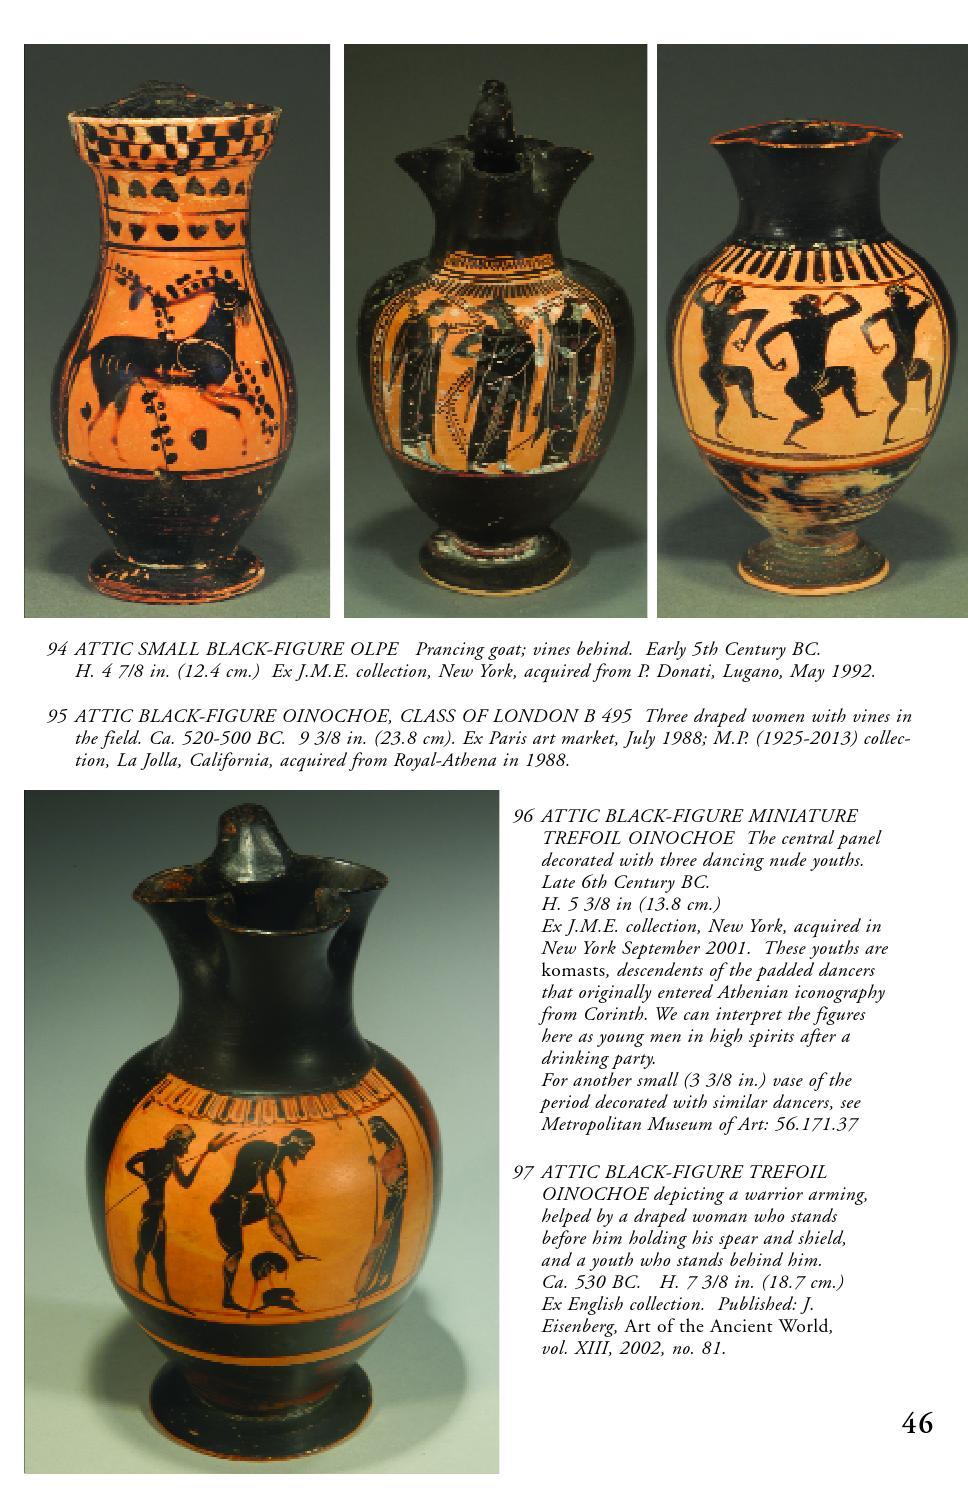 Athena (b. 1988)